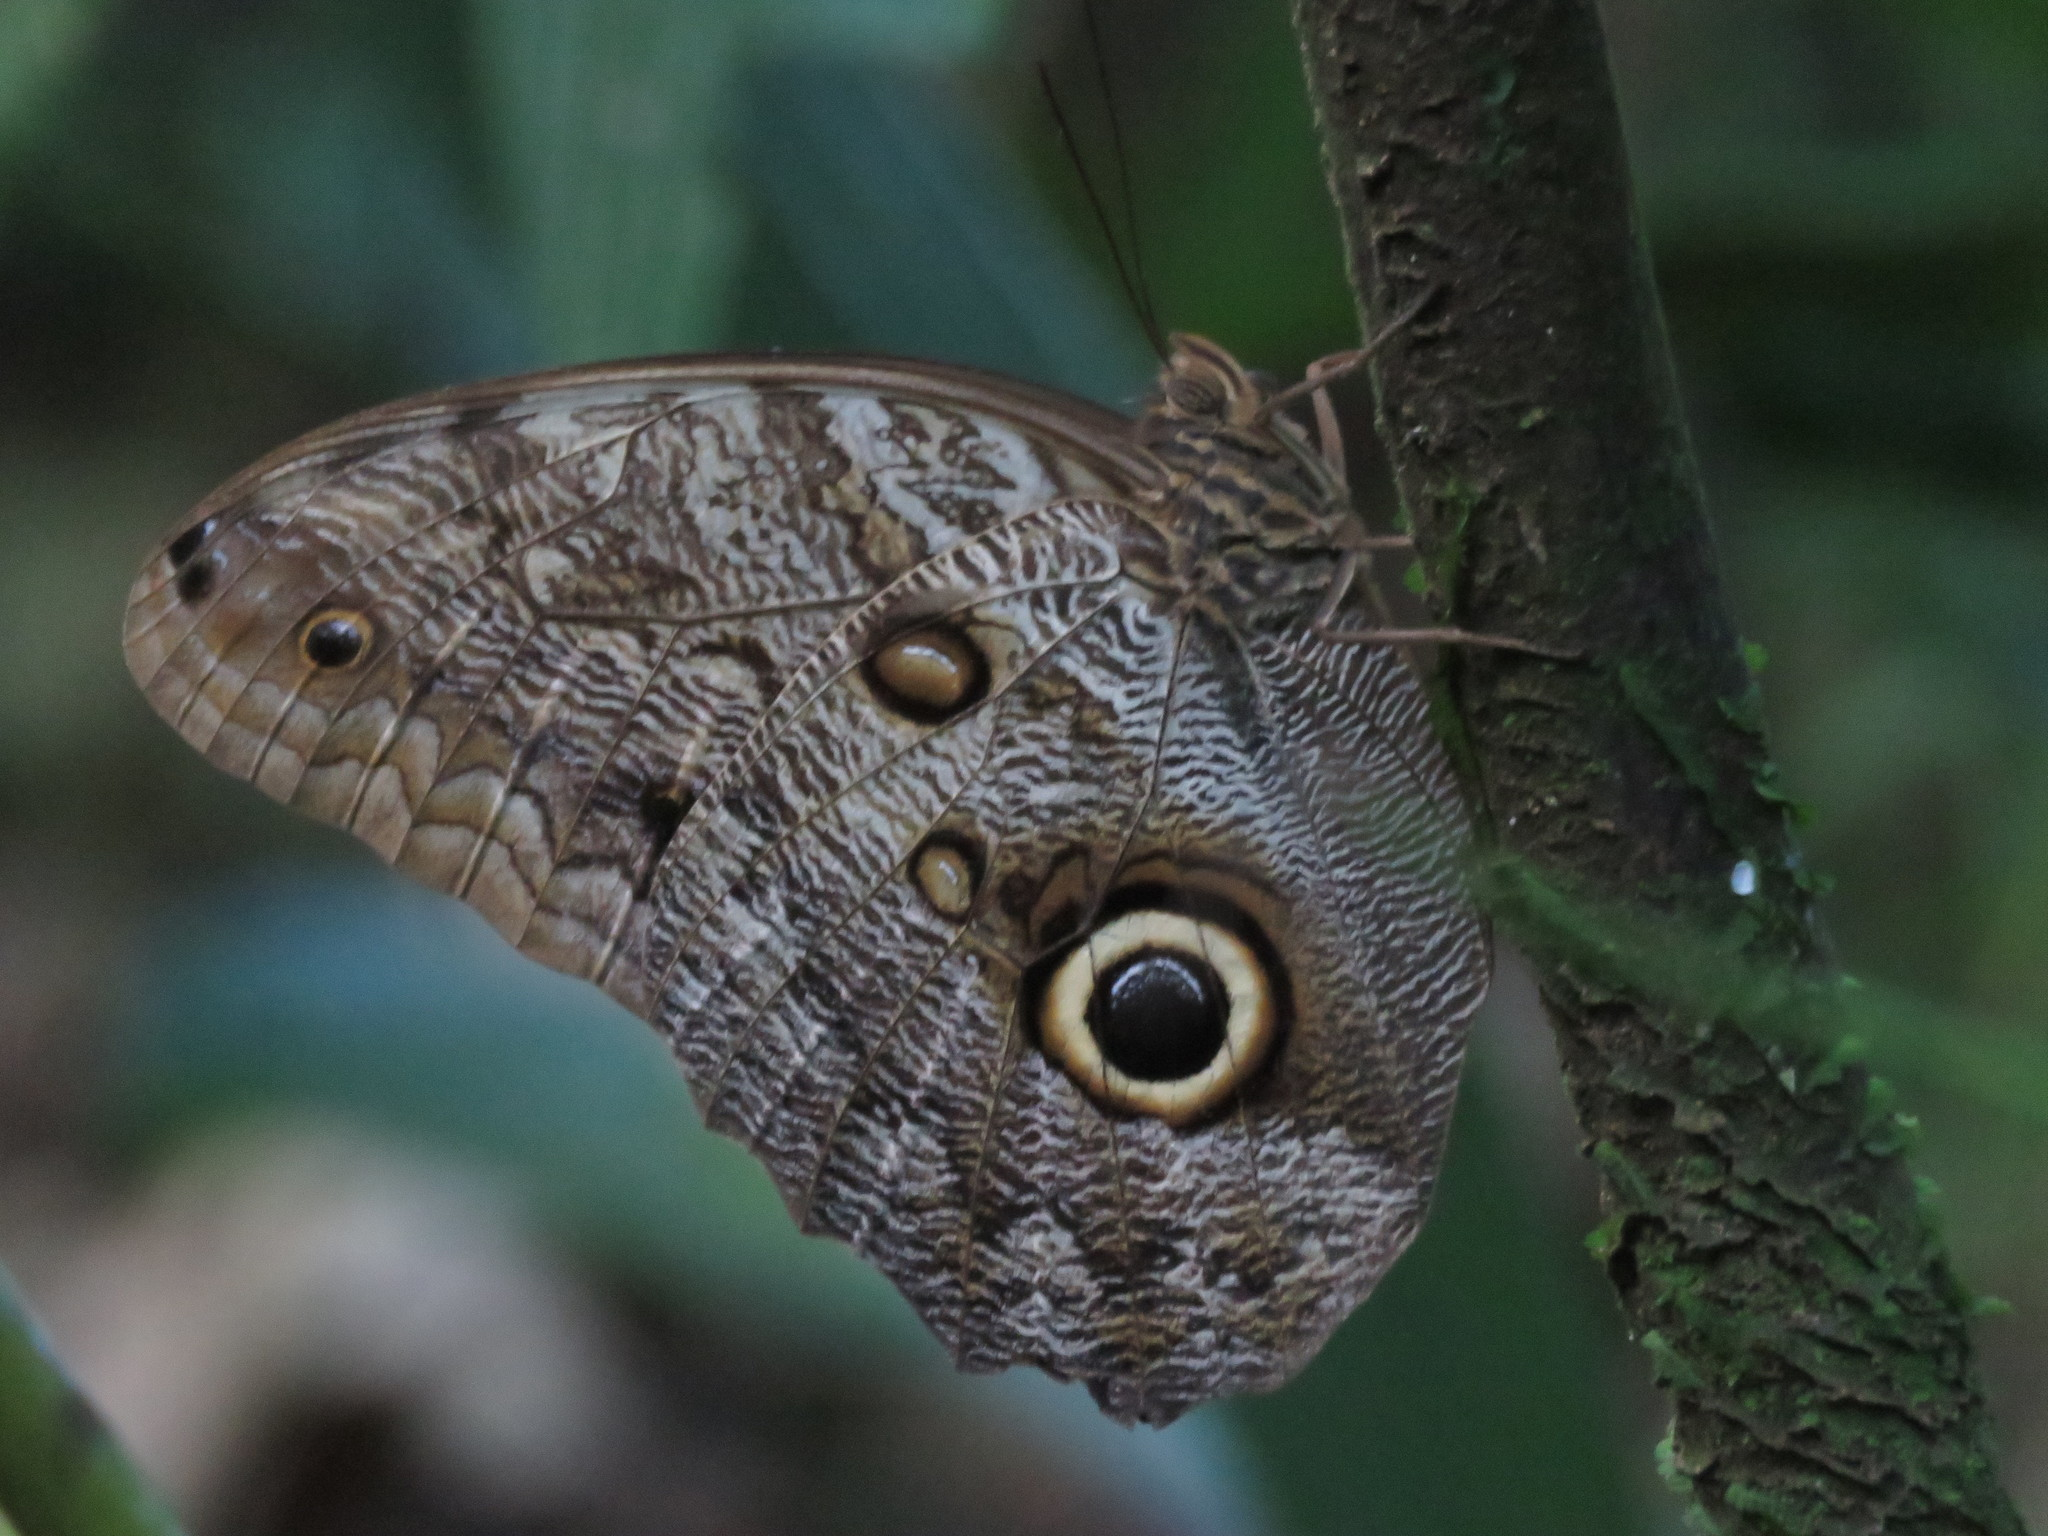 Caligo telamonius - Wikipedia